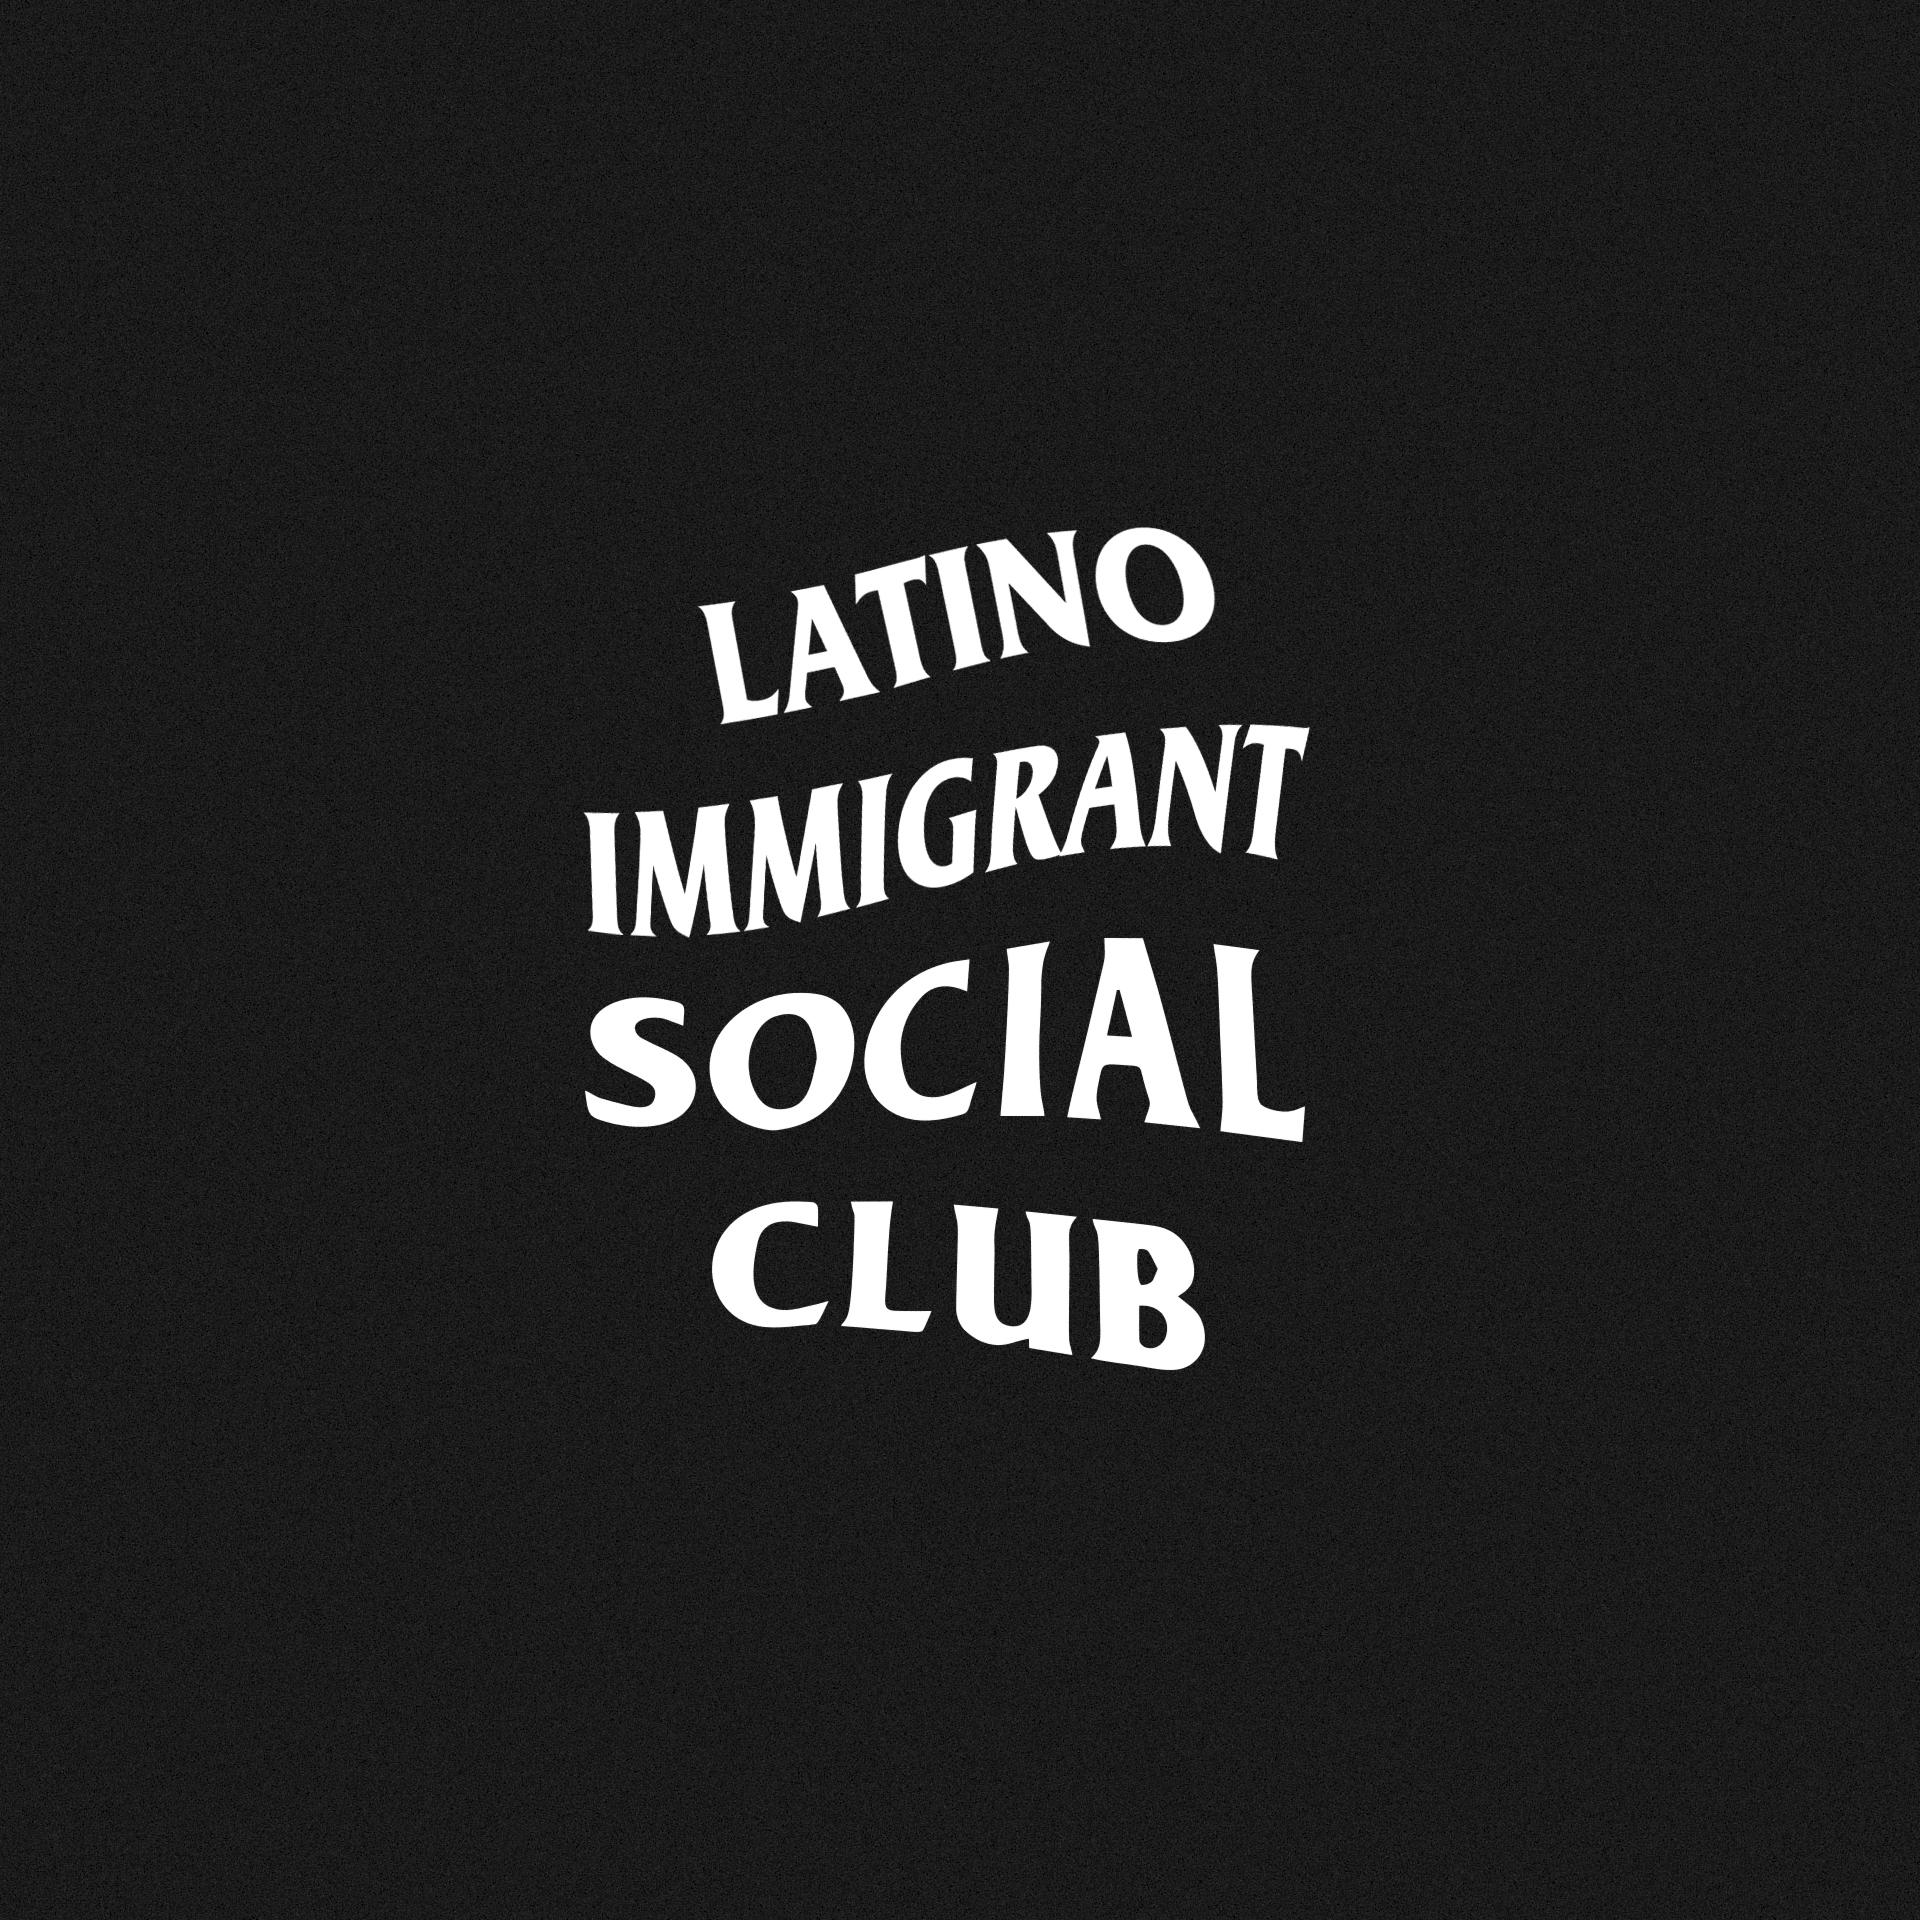 LatinoImmigrantSocialClub.jpg